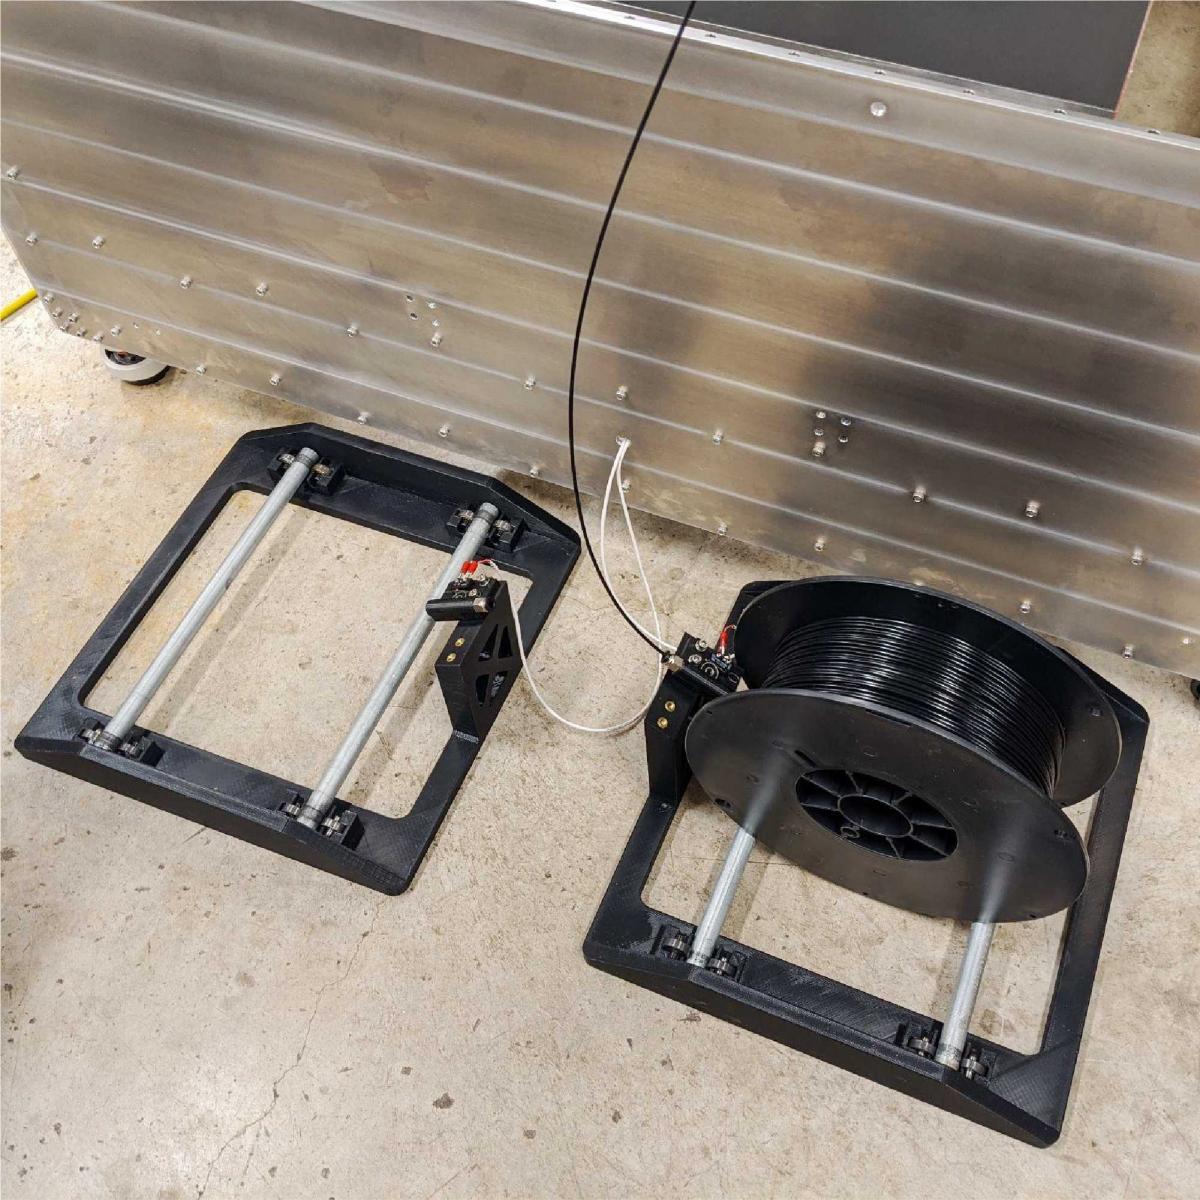 Exabot Counter Weight Filament